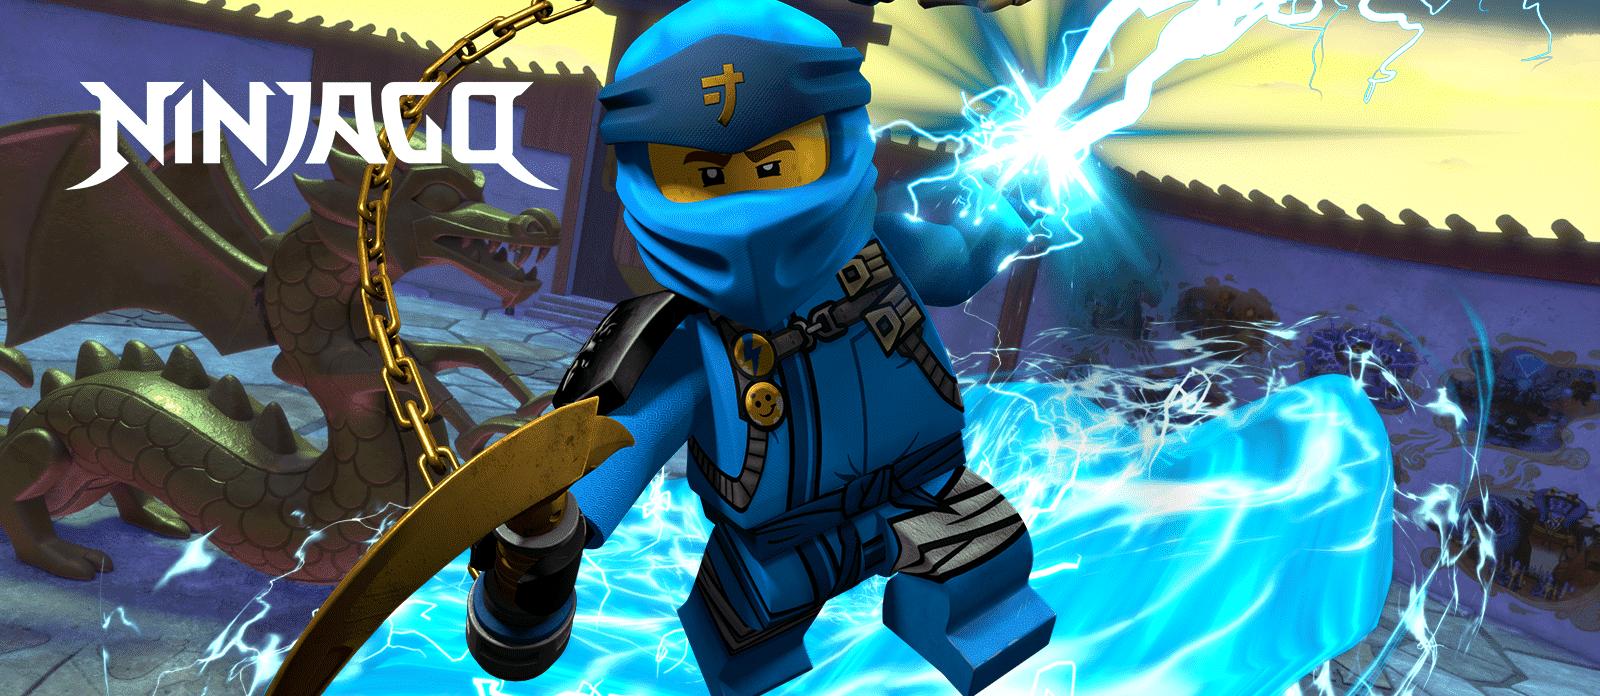 LEGO Ninjago 71755 Конструктор ЛЕГО Ниндзяго Храм Бескрайнего моря